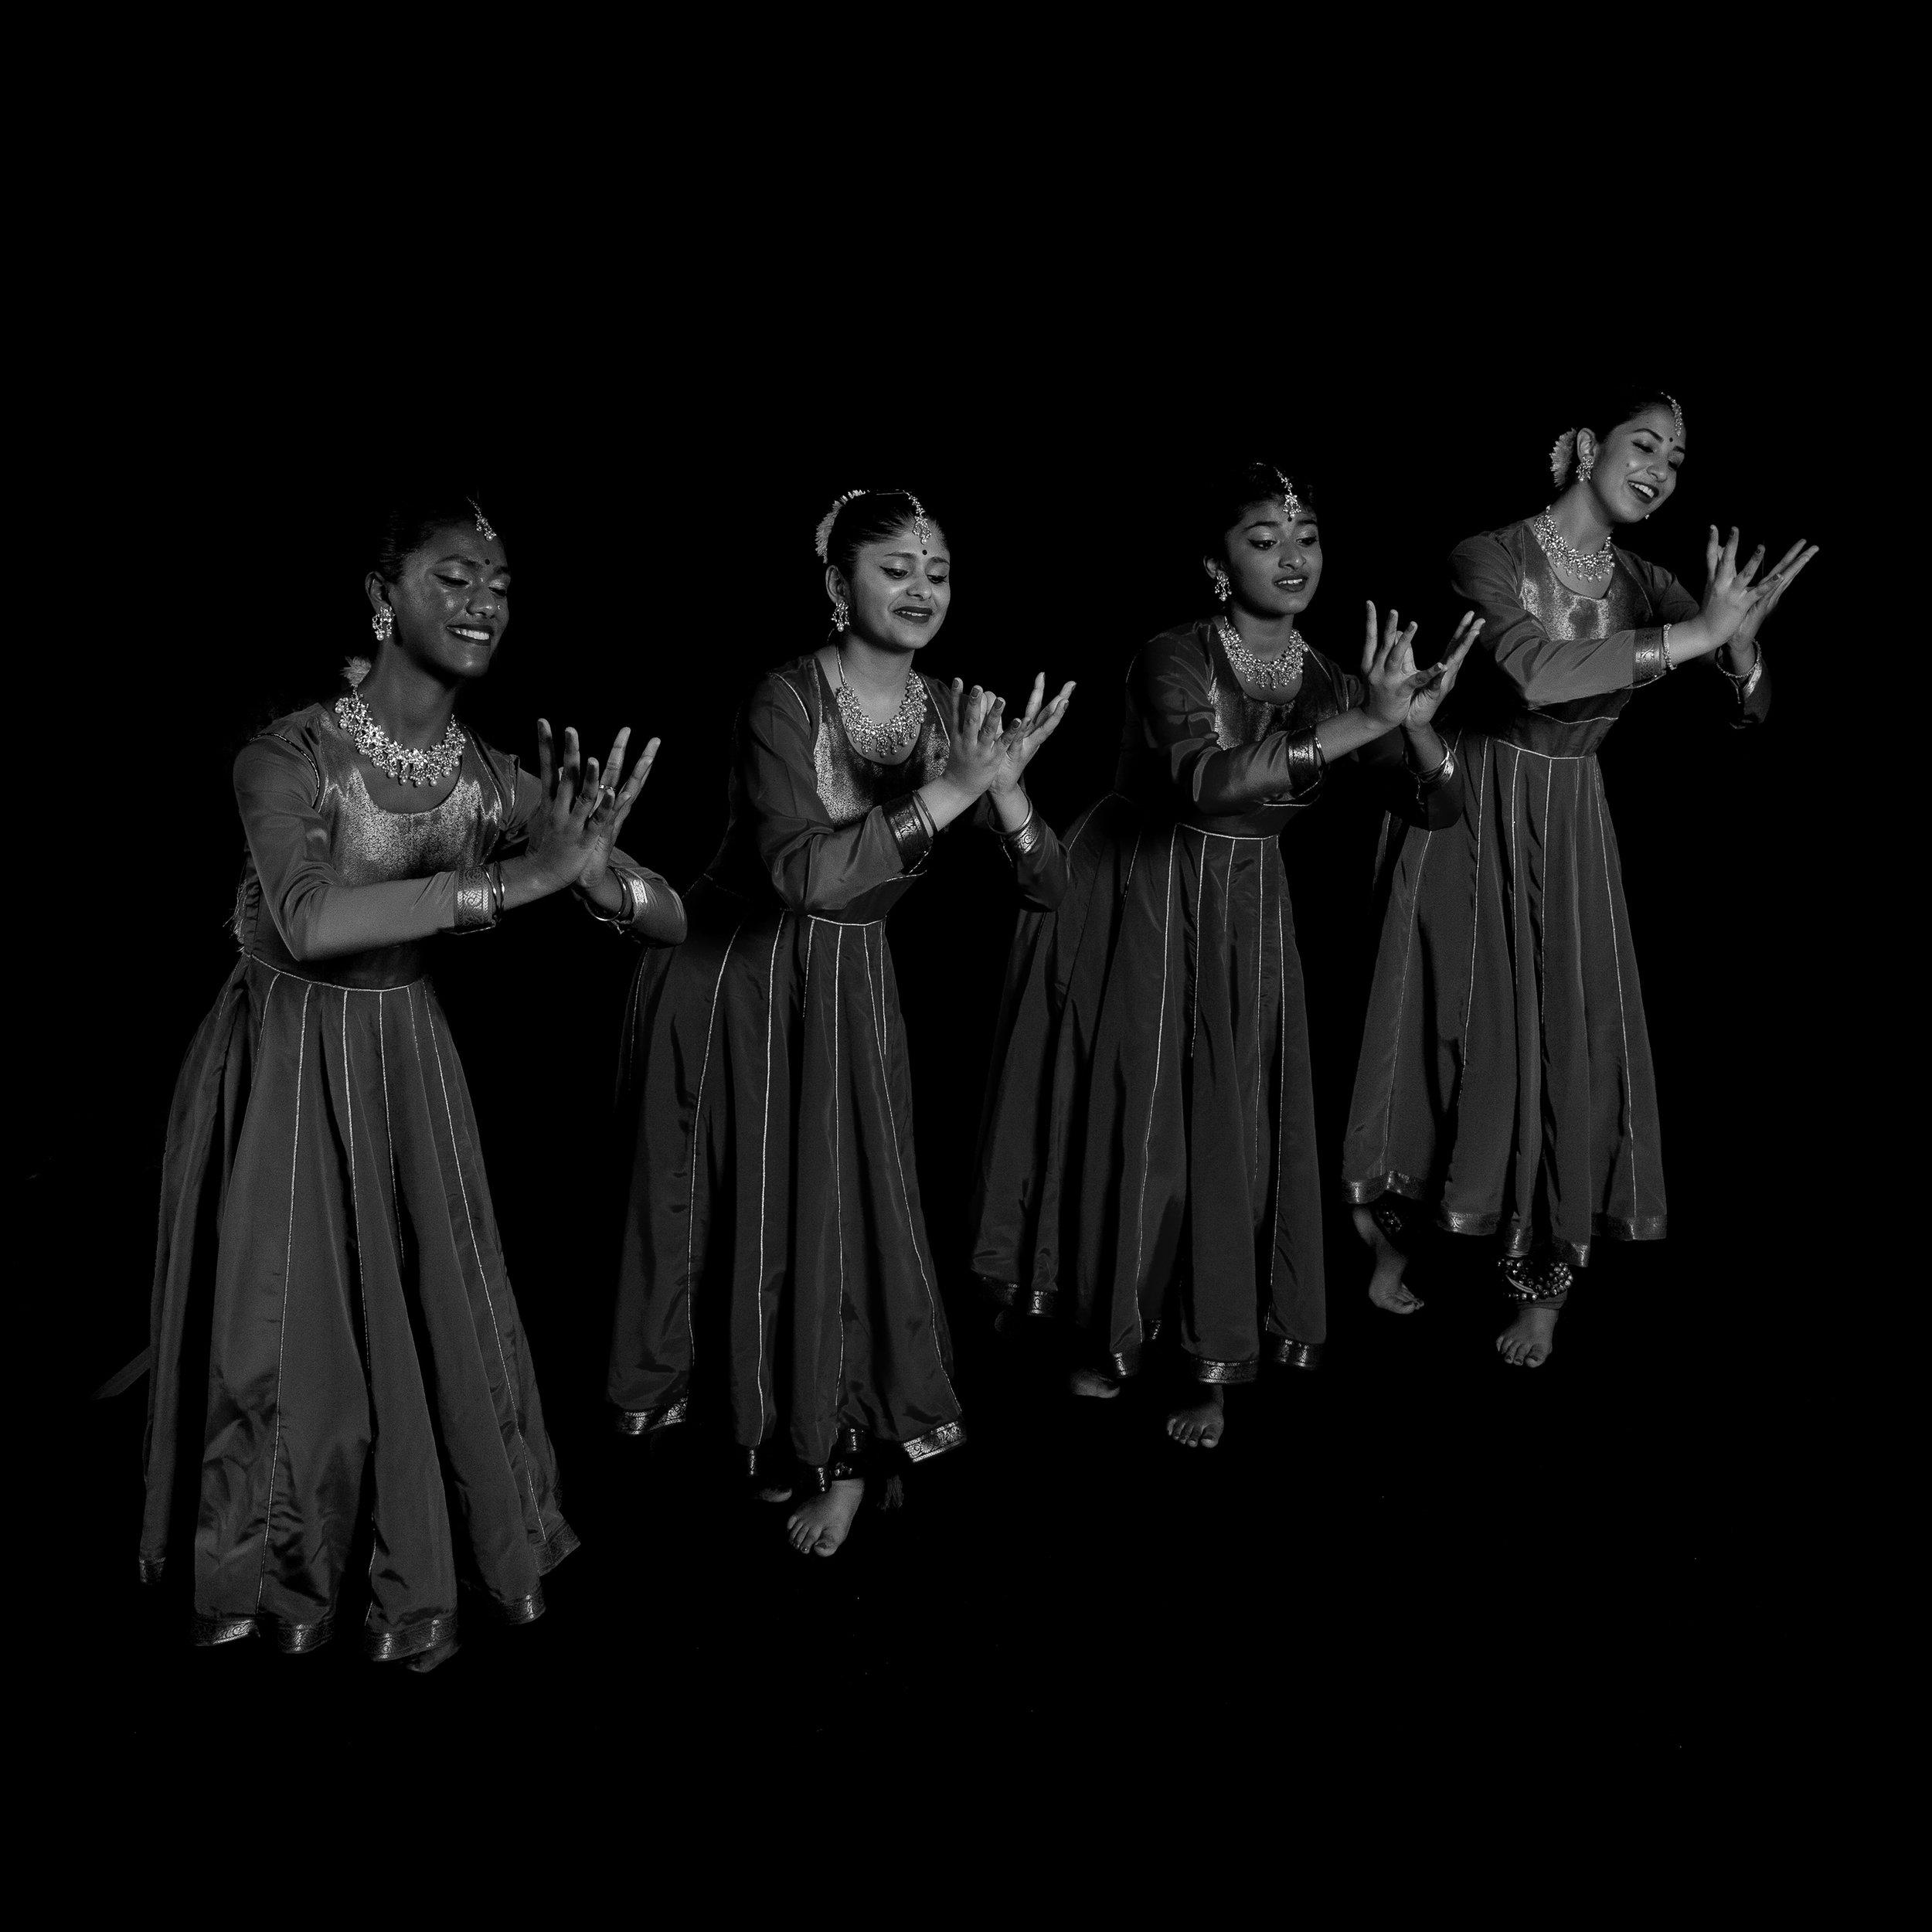 Farah Yasmeen Shaikh & Noorani Dance Company